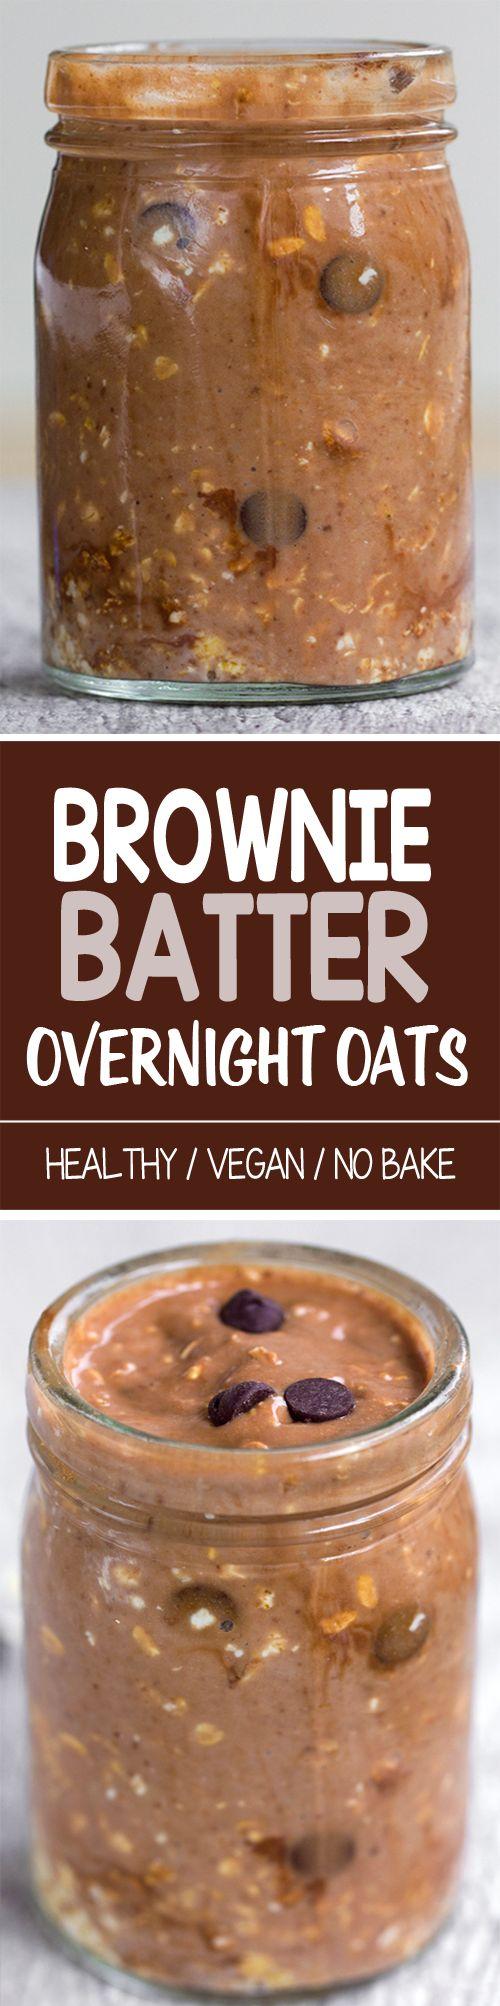 Brownie Batter Overnight Oats!!!